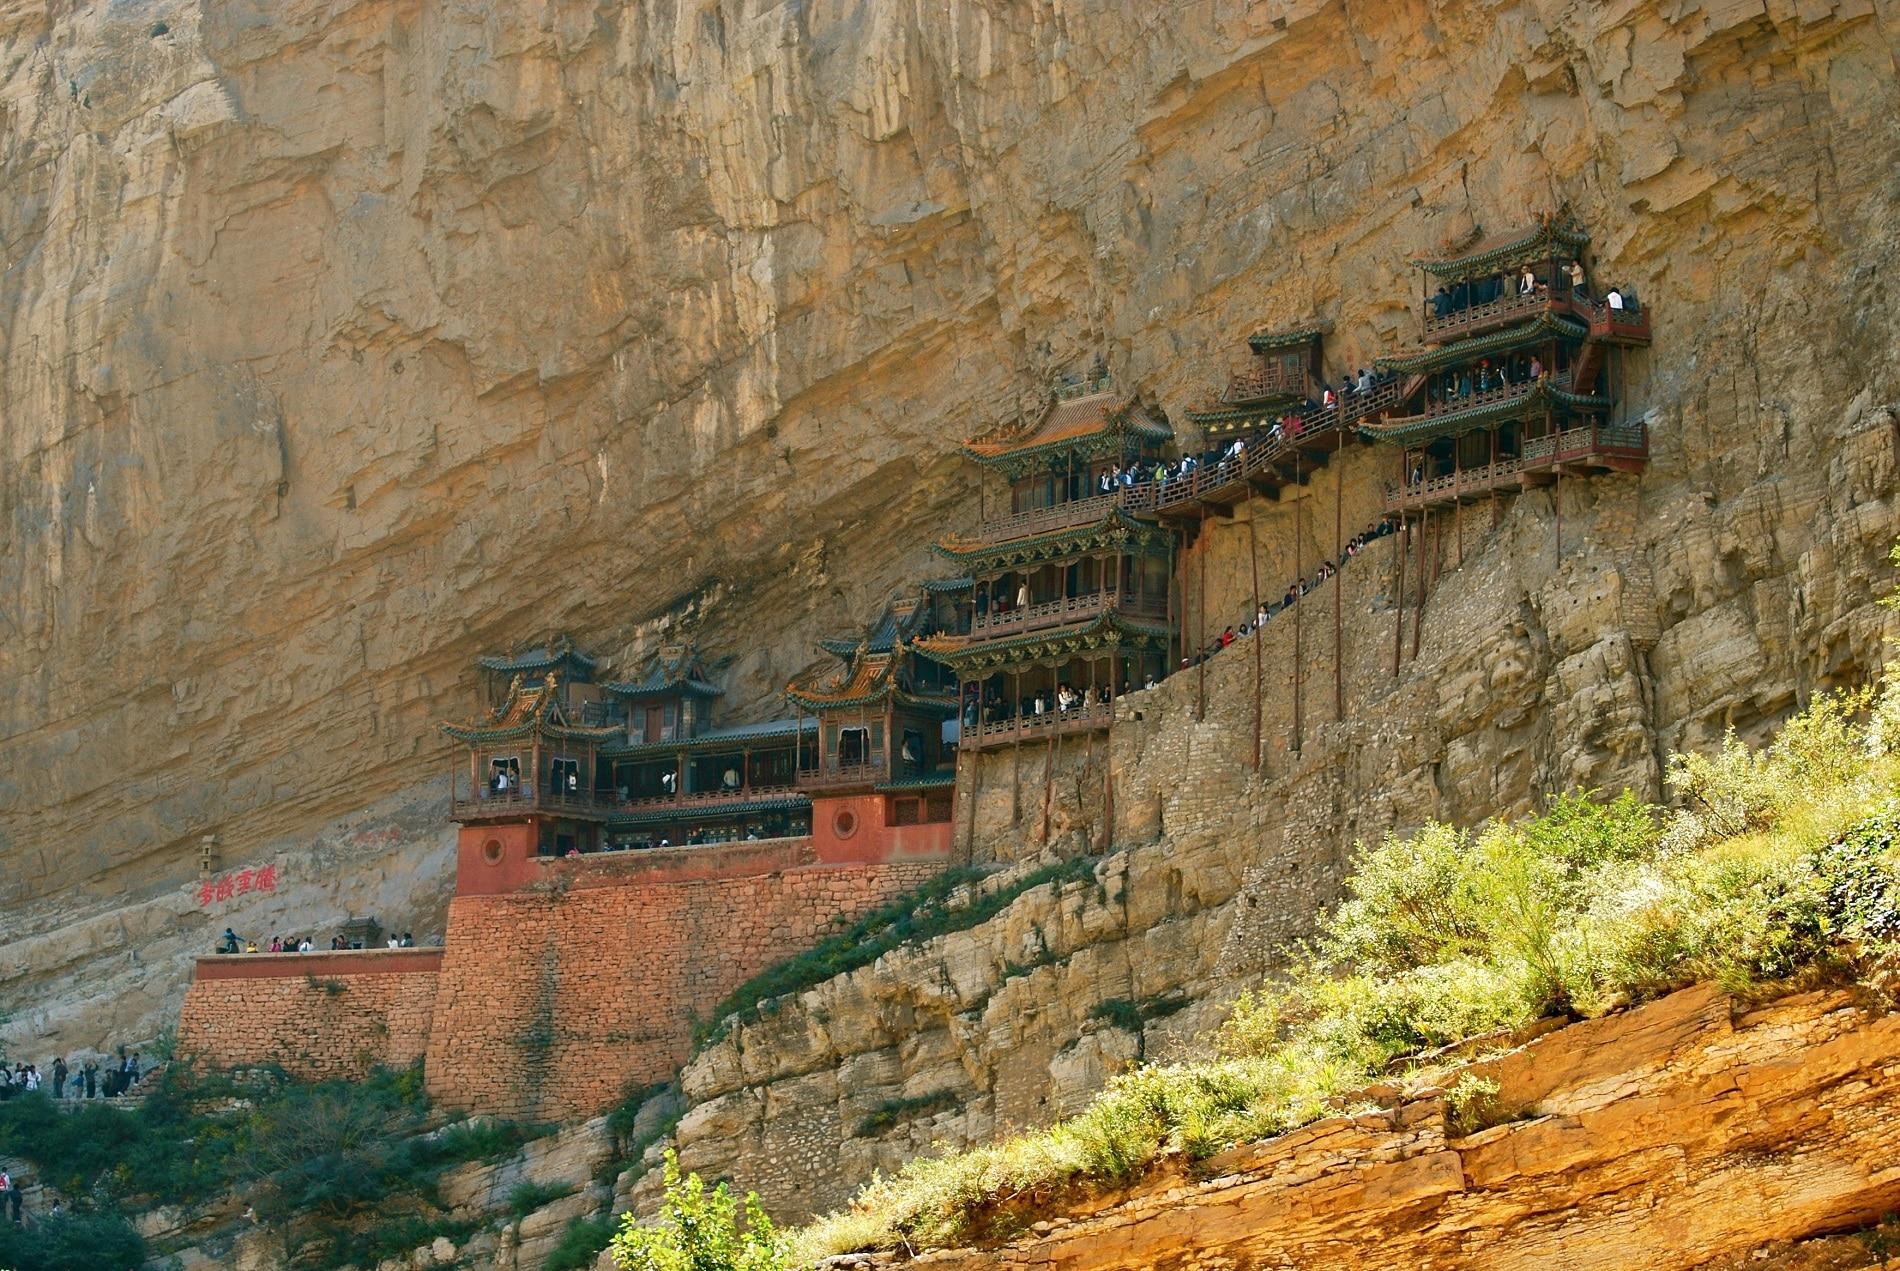 Templul Suspendat din Datong, provincia Shanxi, China